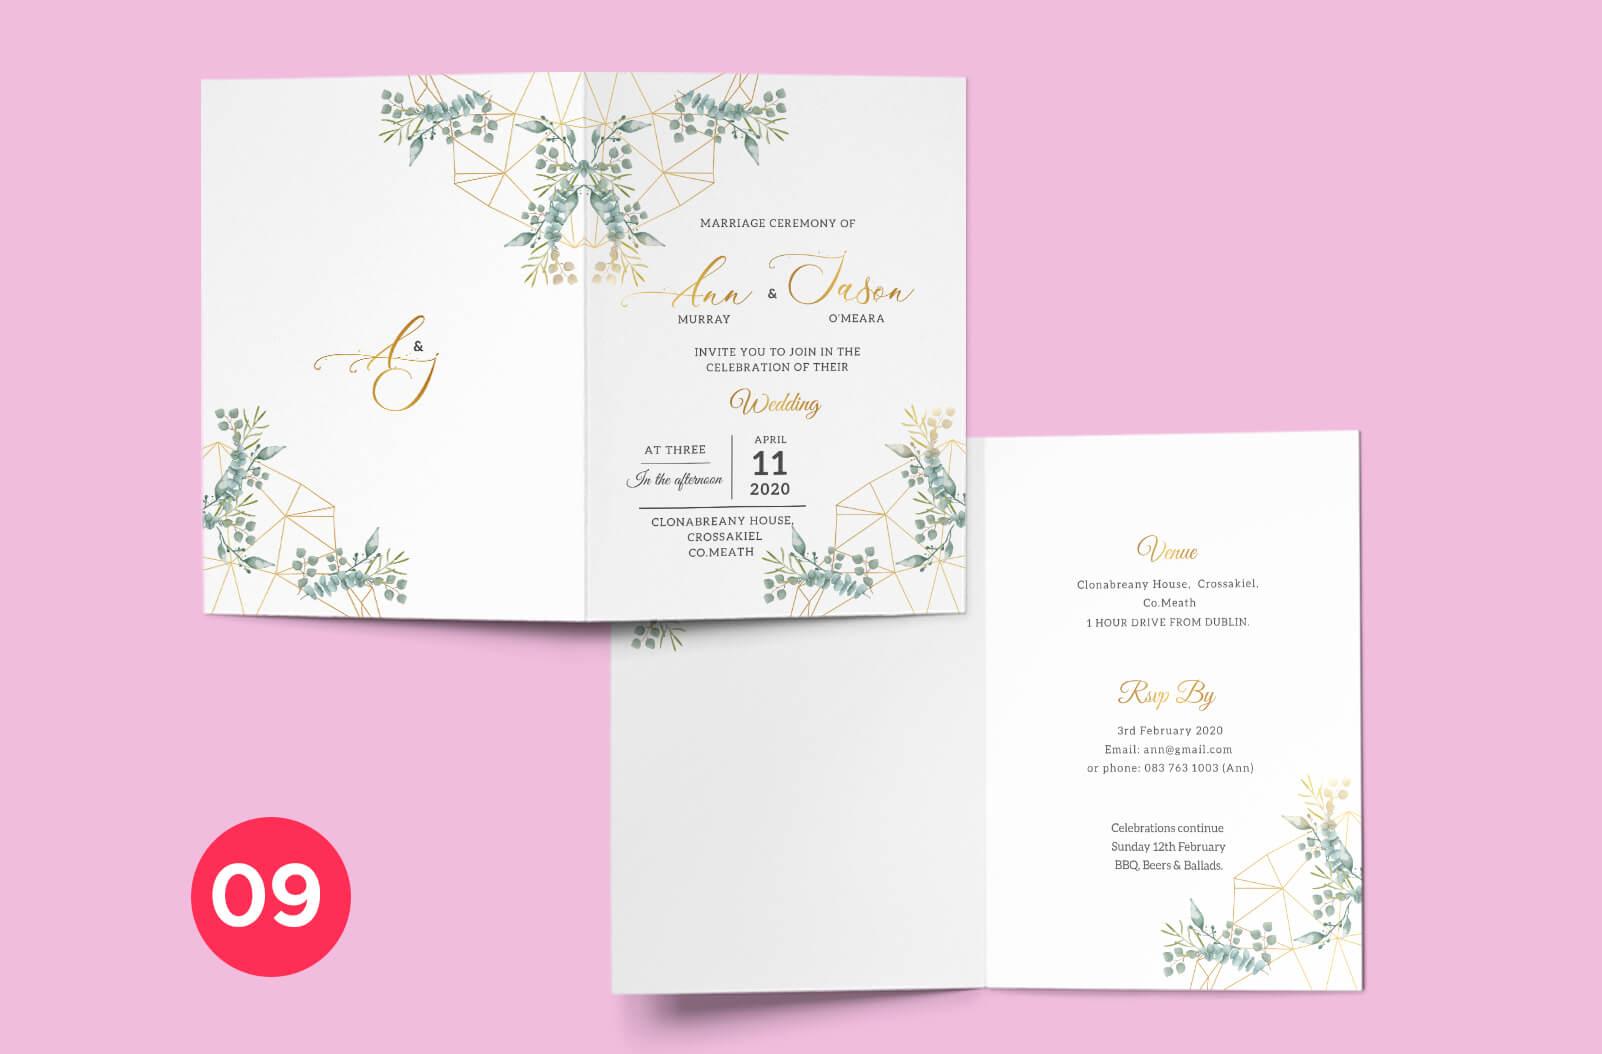 Wedding Invitation Mockup - Print Ready